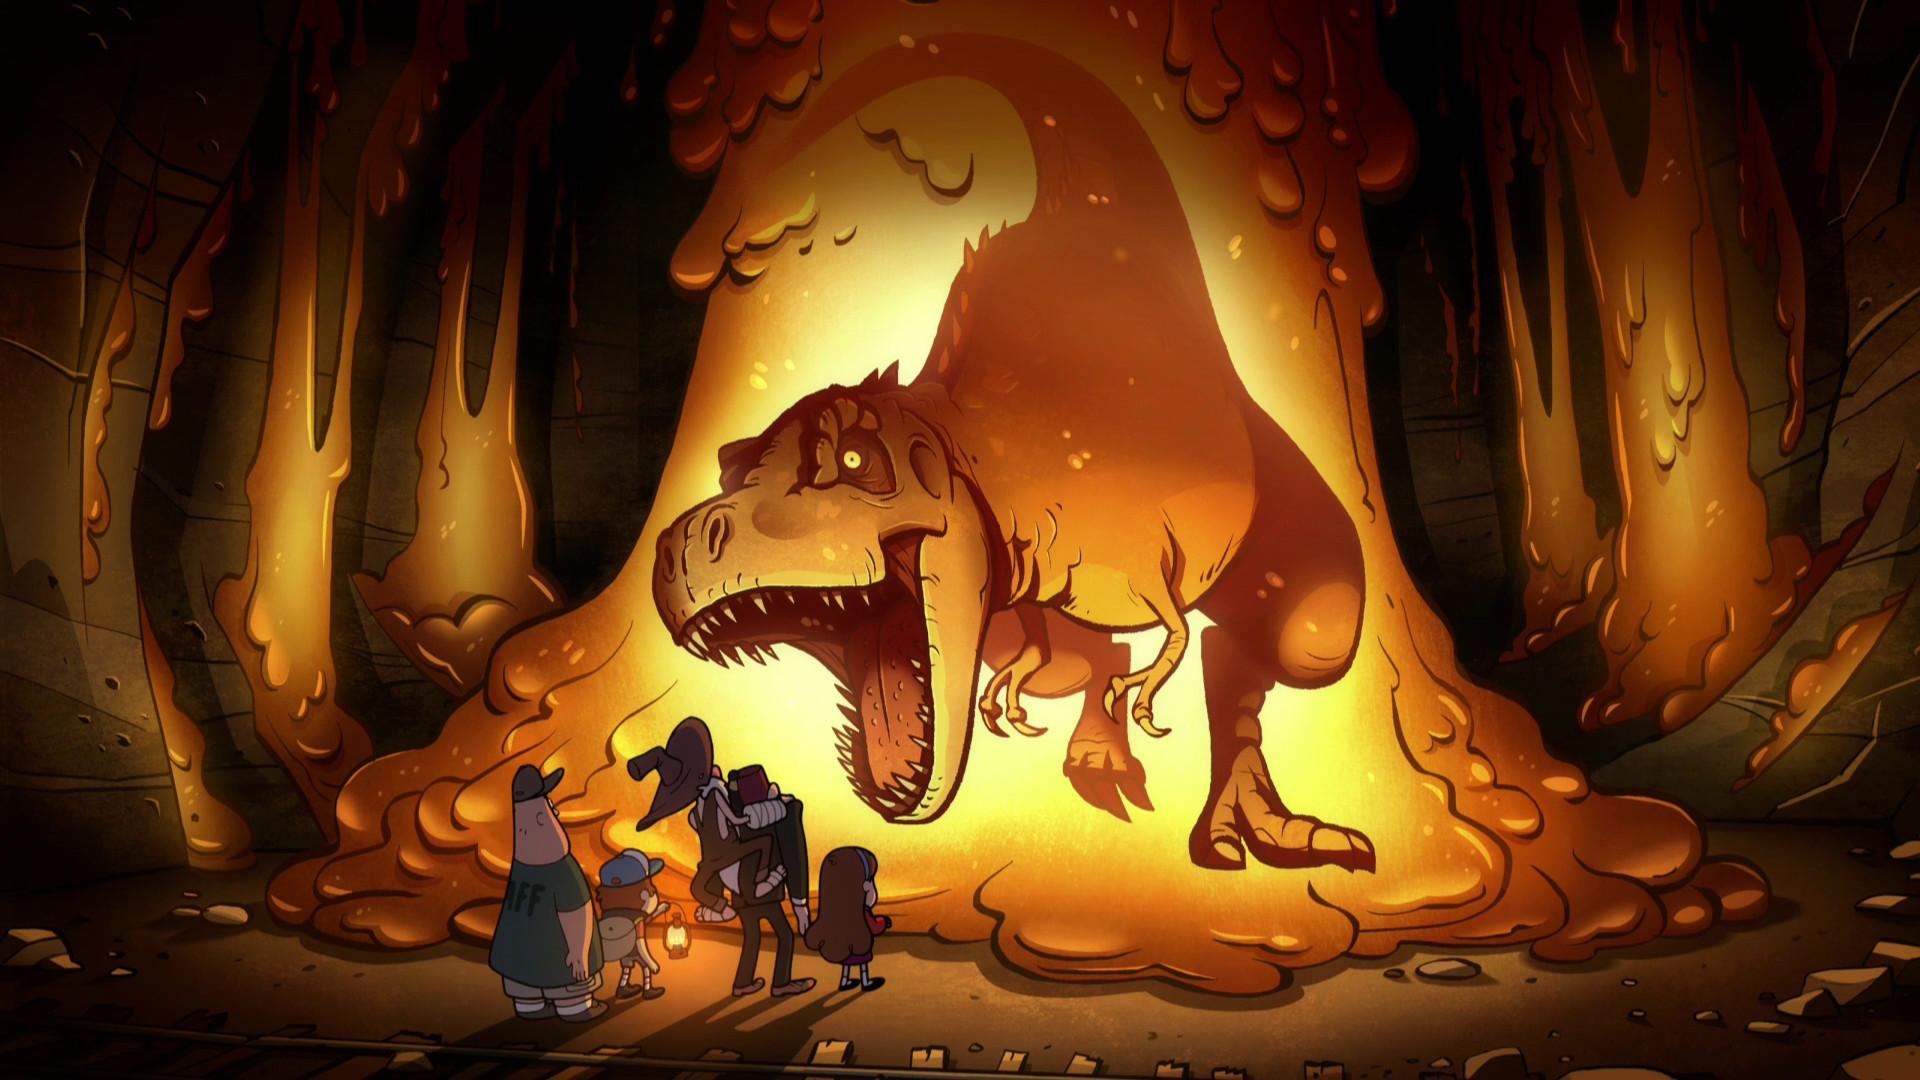 TV Show – Gravity Falls Dinosaur Tyrannosaurus Rex Wallpaper